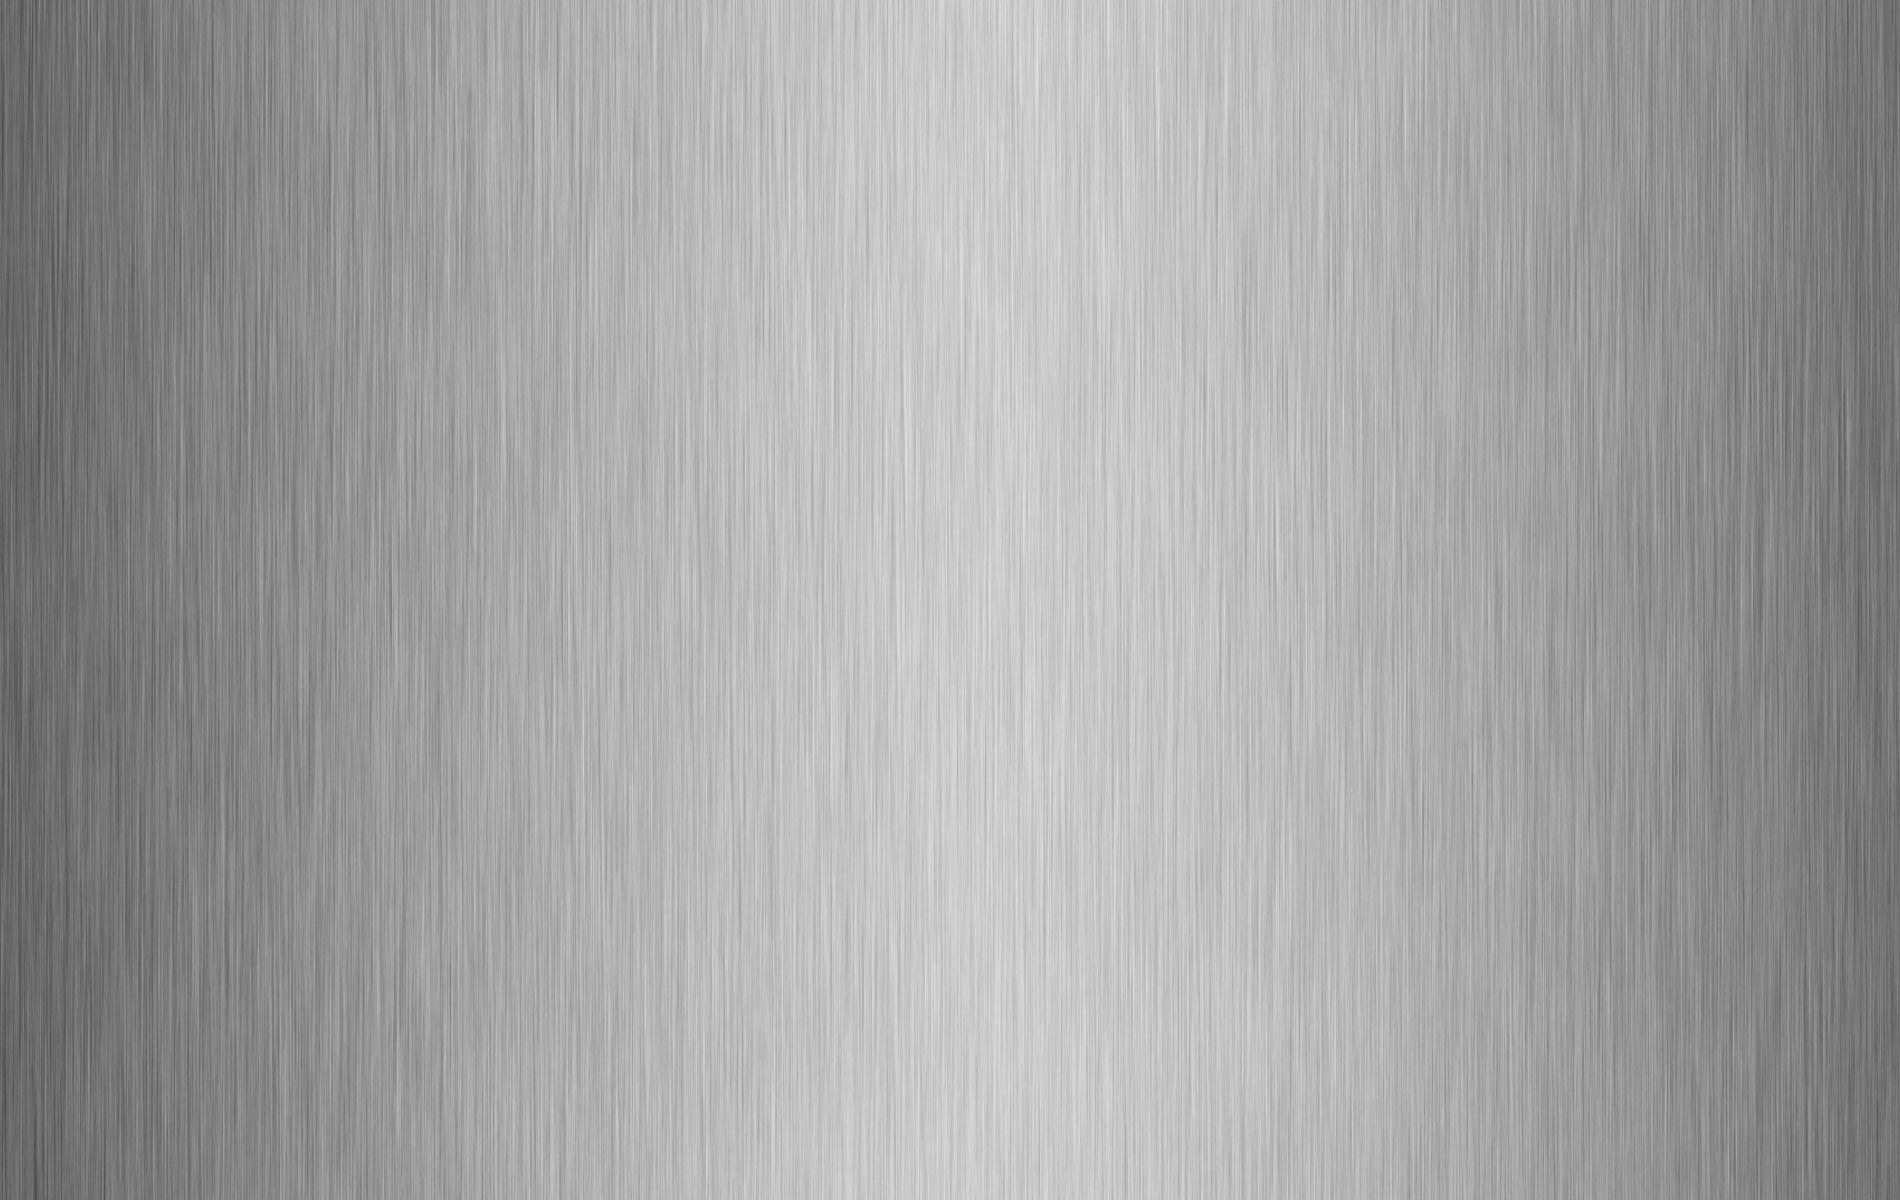 Silver Wall Paper grey and silver wallpaper - wallpapersafari